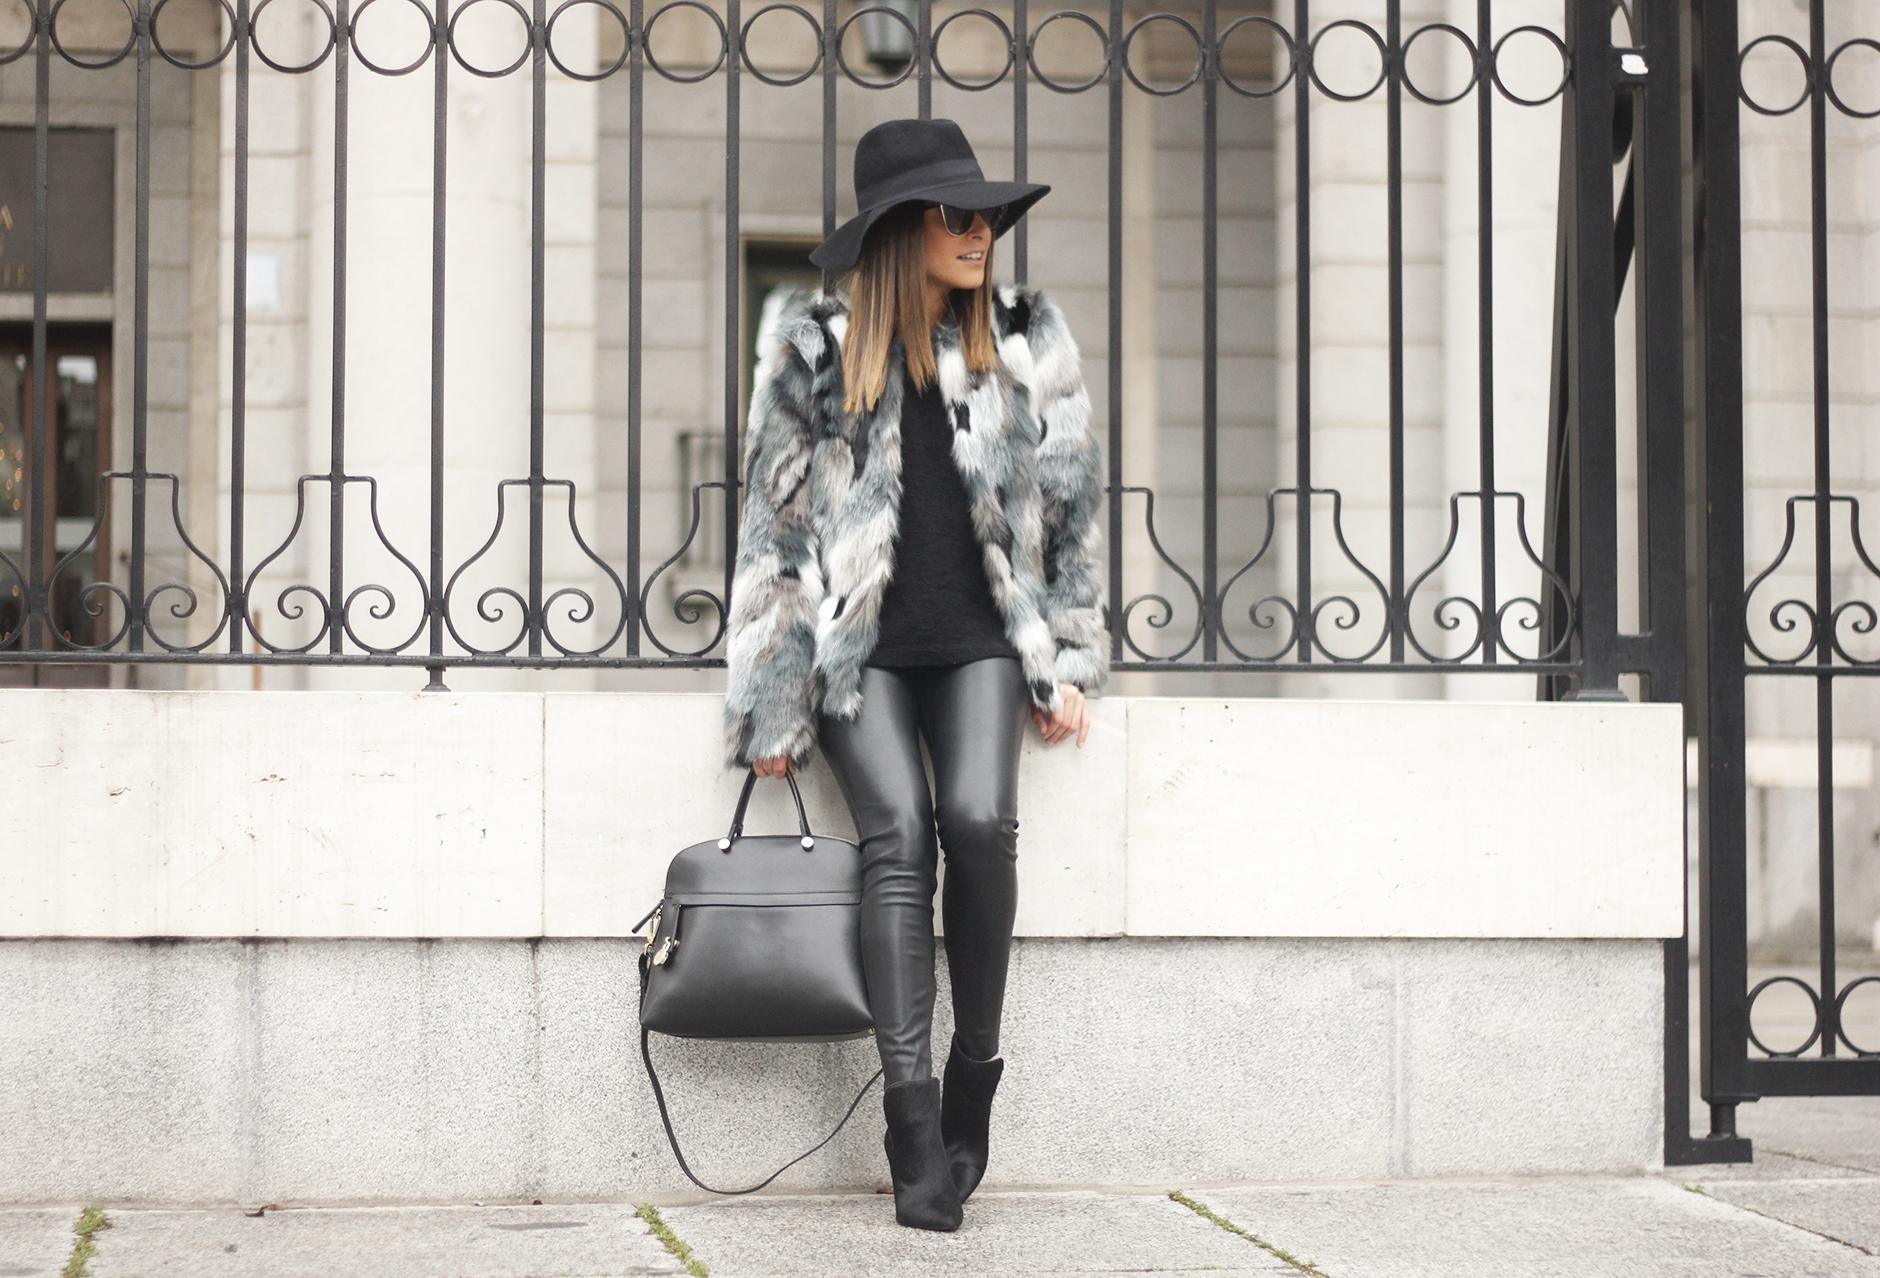 Faux fur coat leatherette pants booties black hat mango streetstyle fashion outfit05